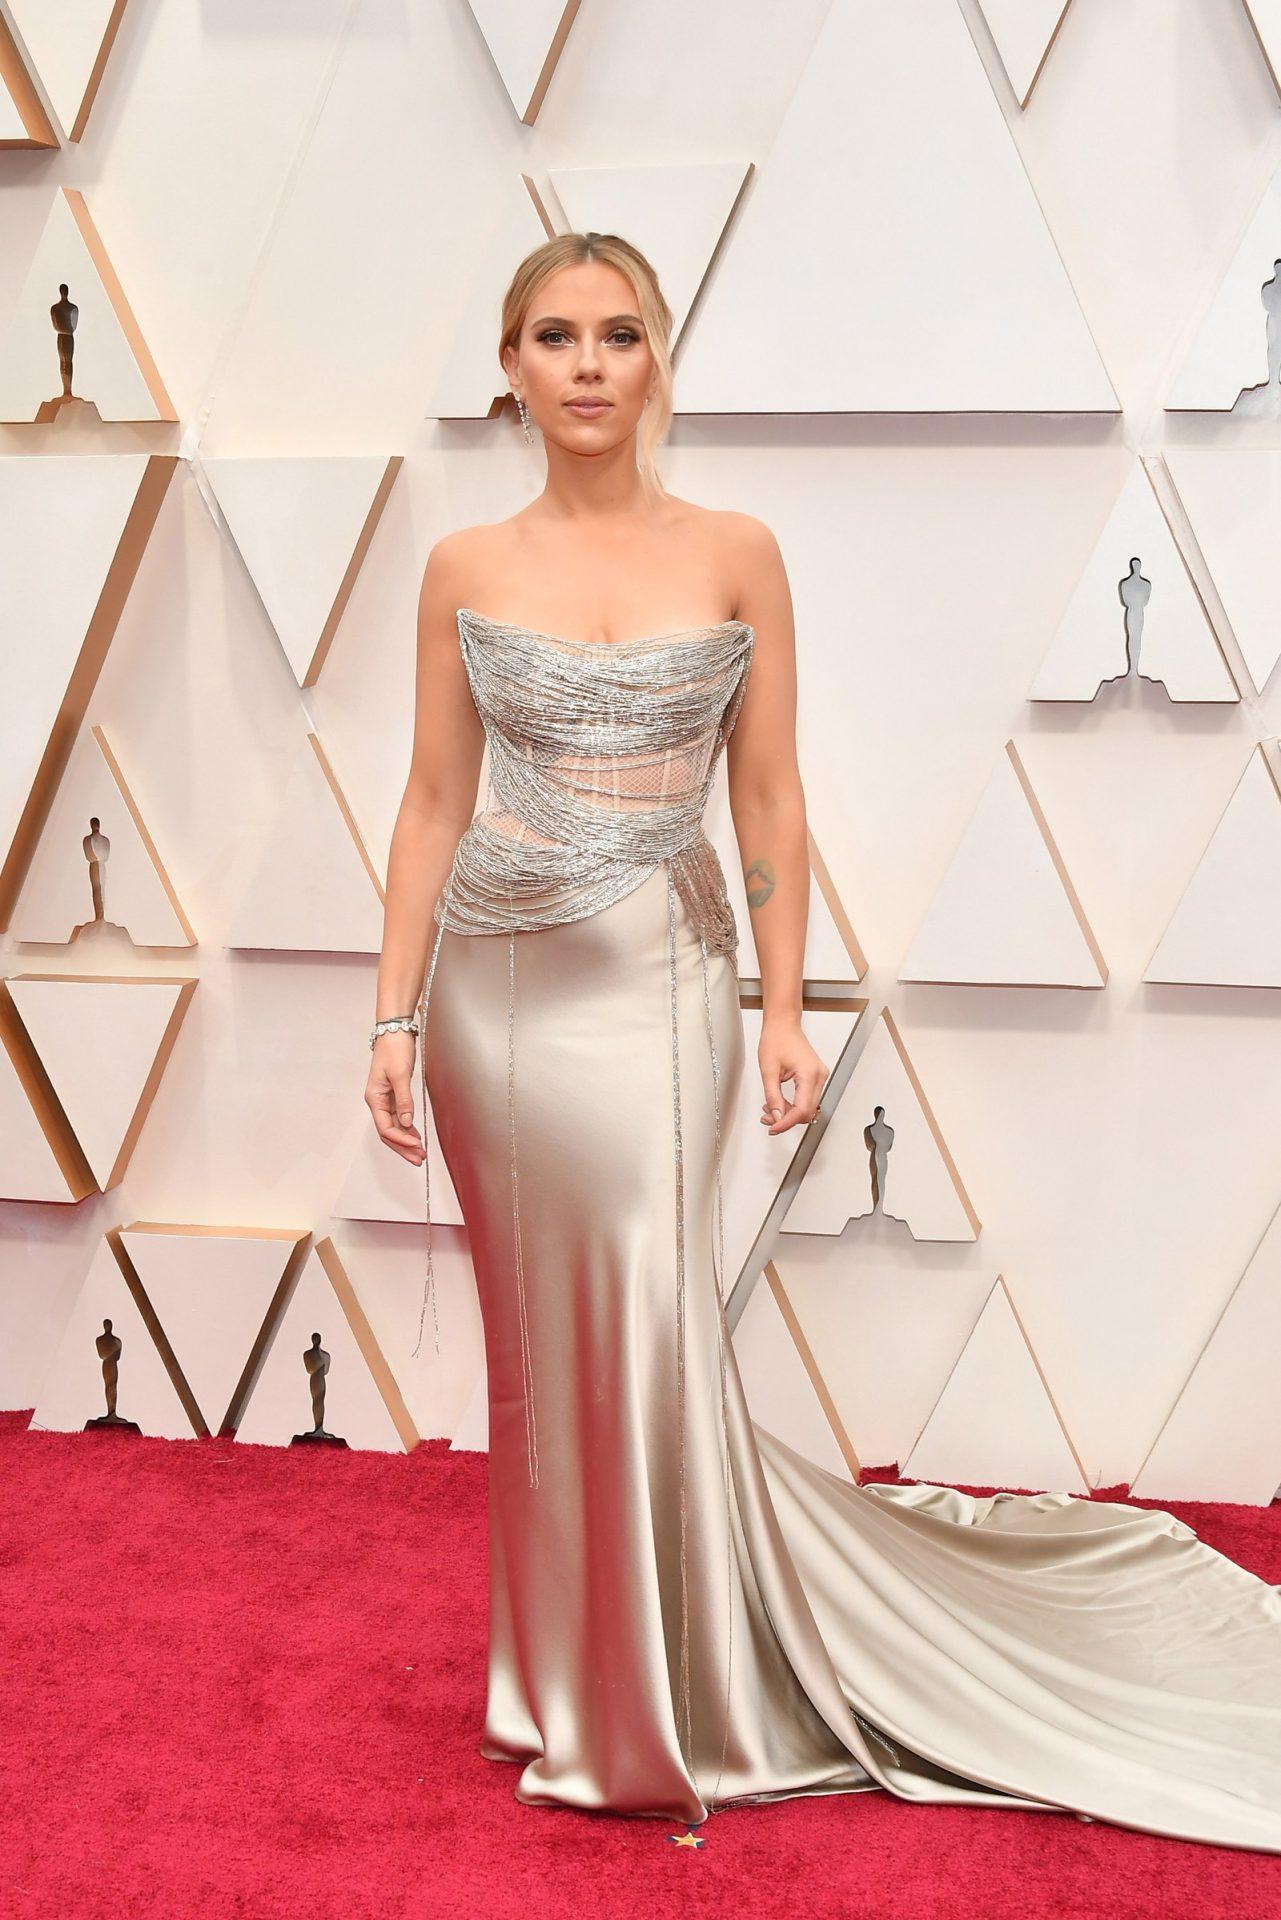 Scarlett Johansson in Oscar de la Renta Oscar 2020